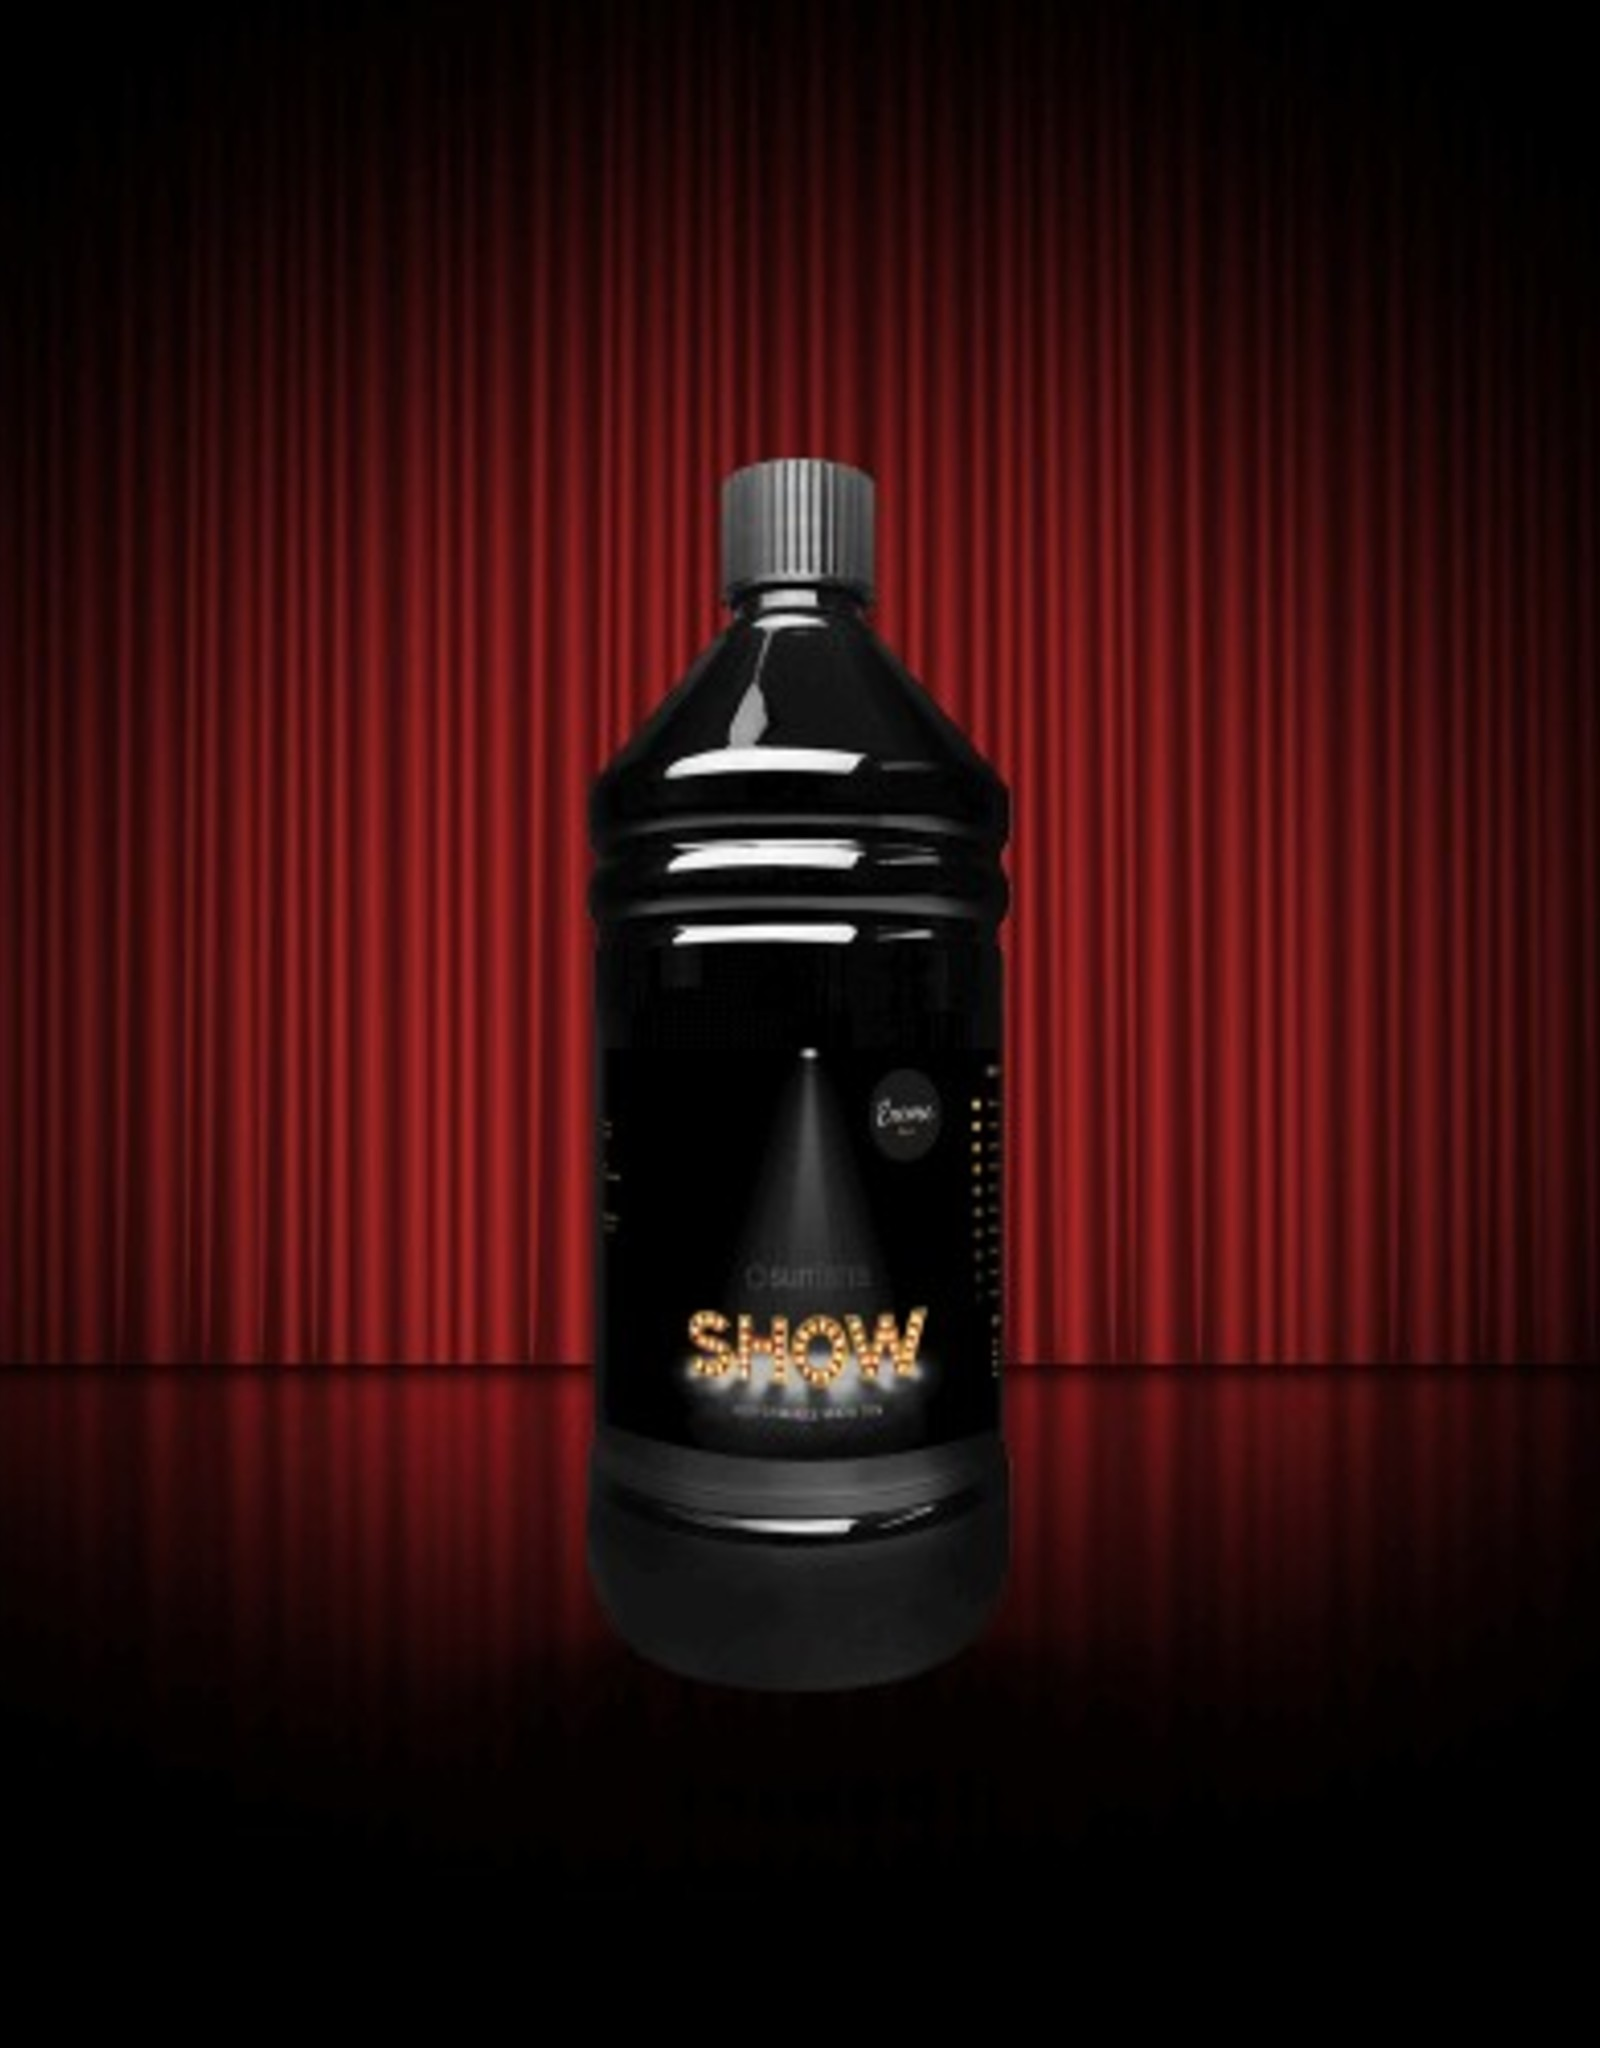 Suntana Suntana V- Dark Tan (12% DHA) / Show Tan Encore - Spray Tan vloeistof